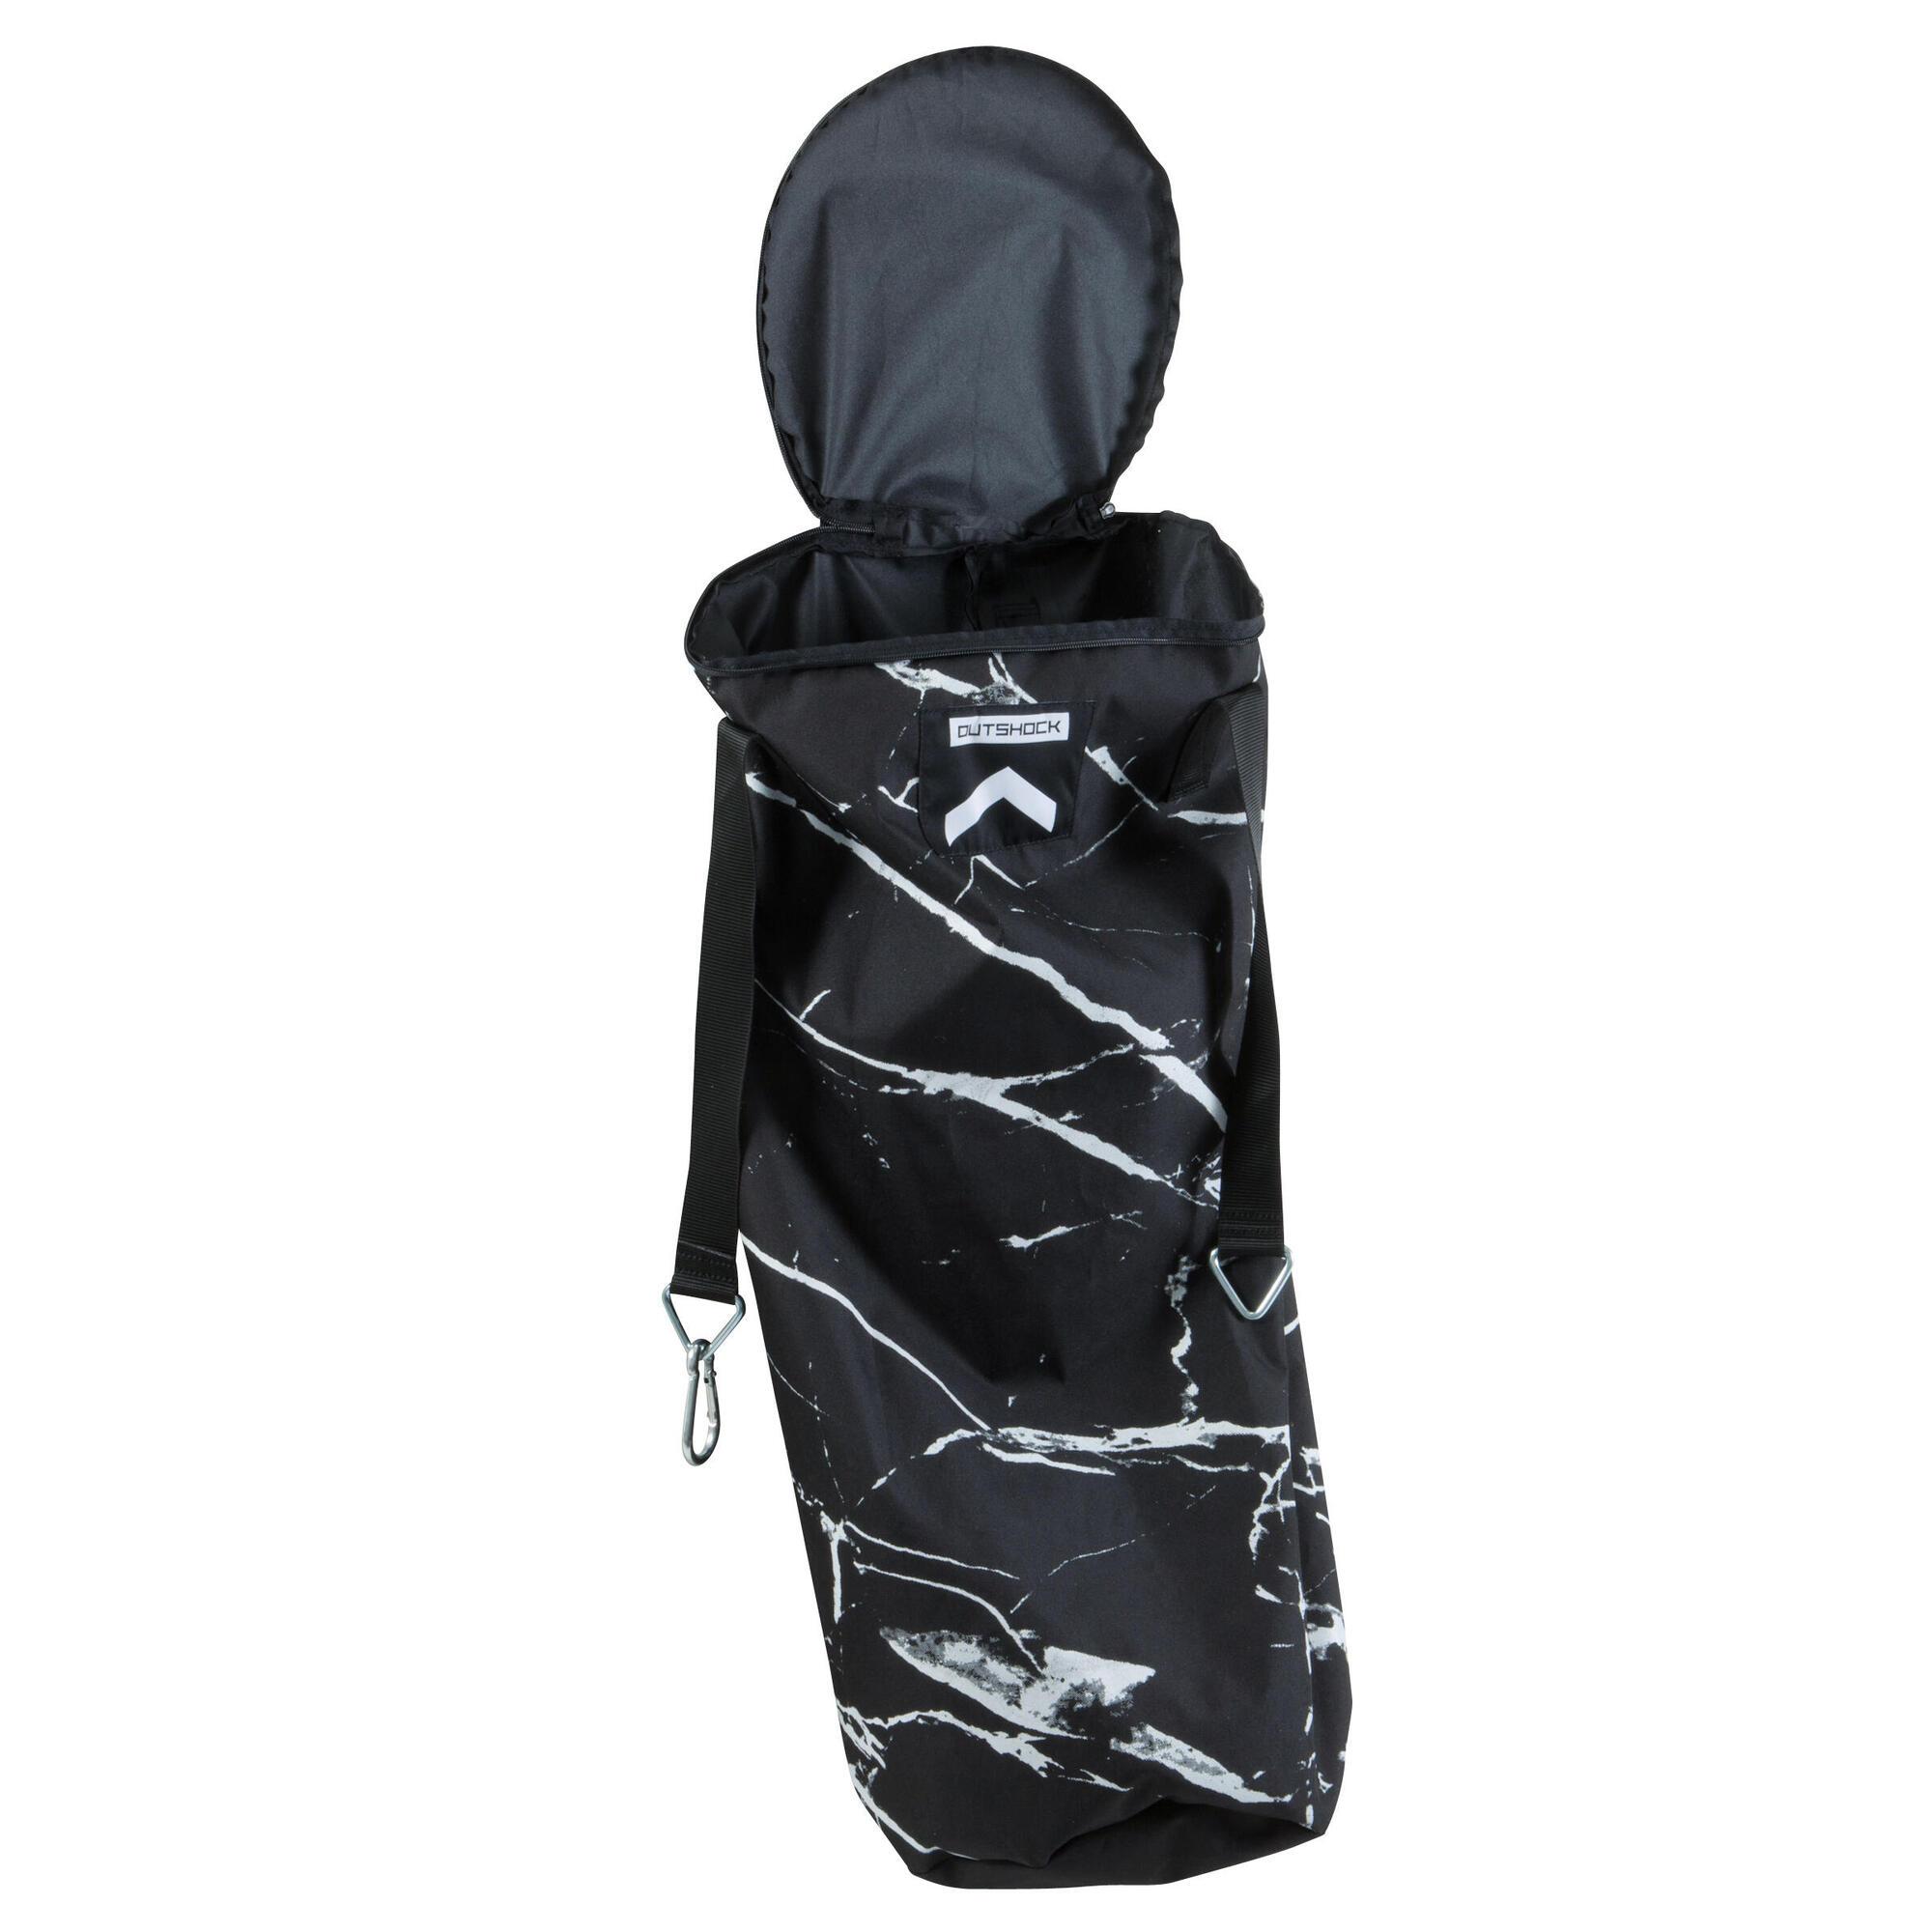 37250e6e9555a Sacs de frappe et accessoires de frappe | Domyos by Decathlon